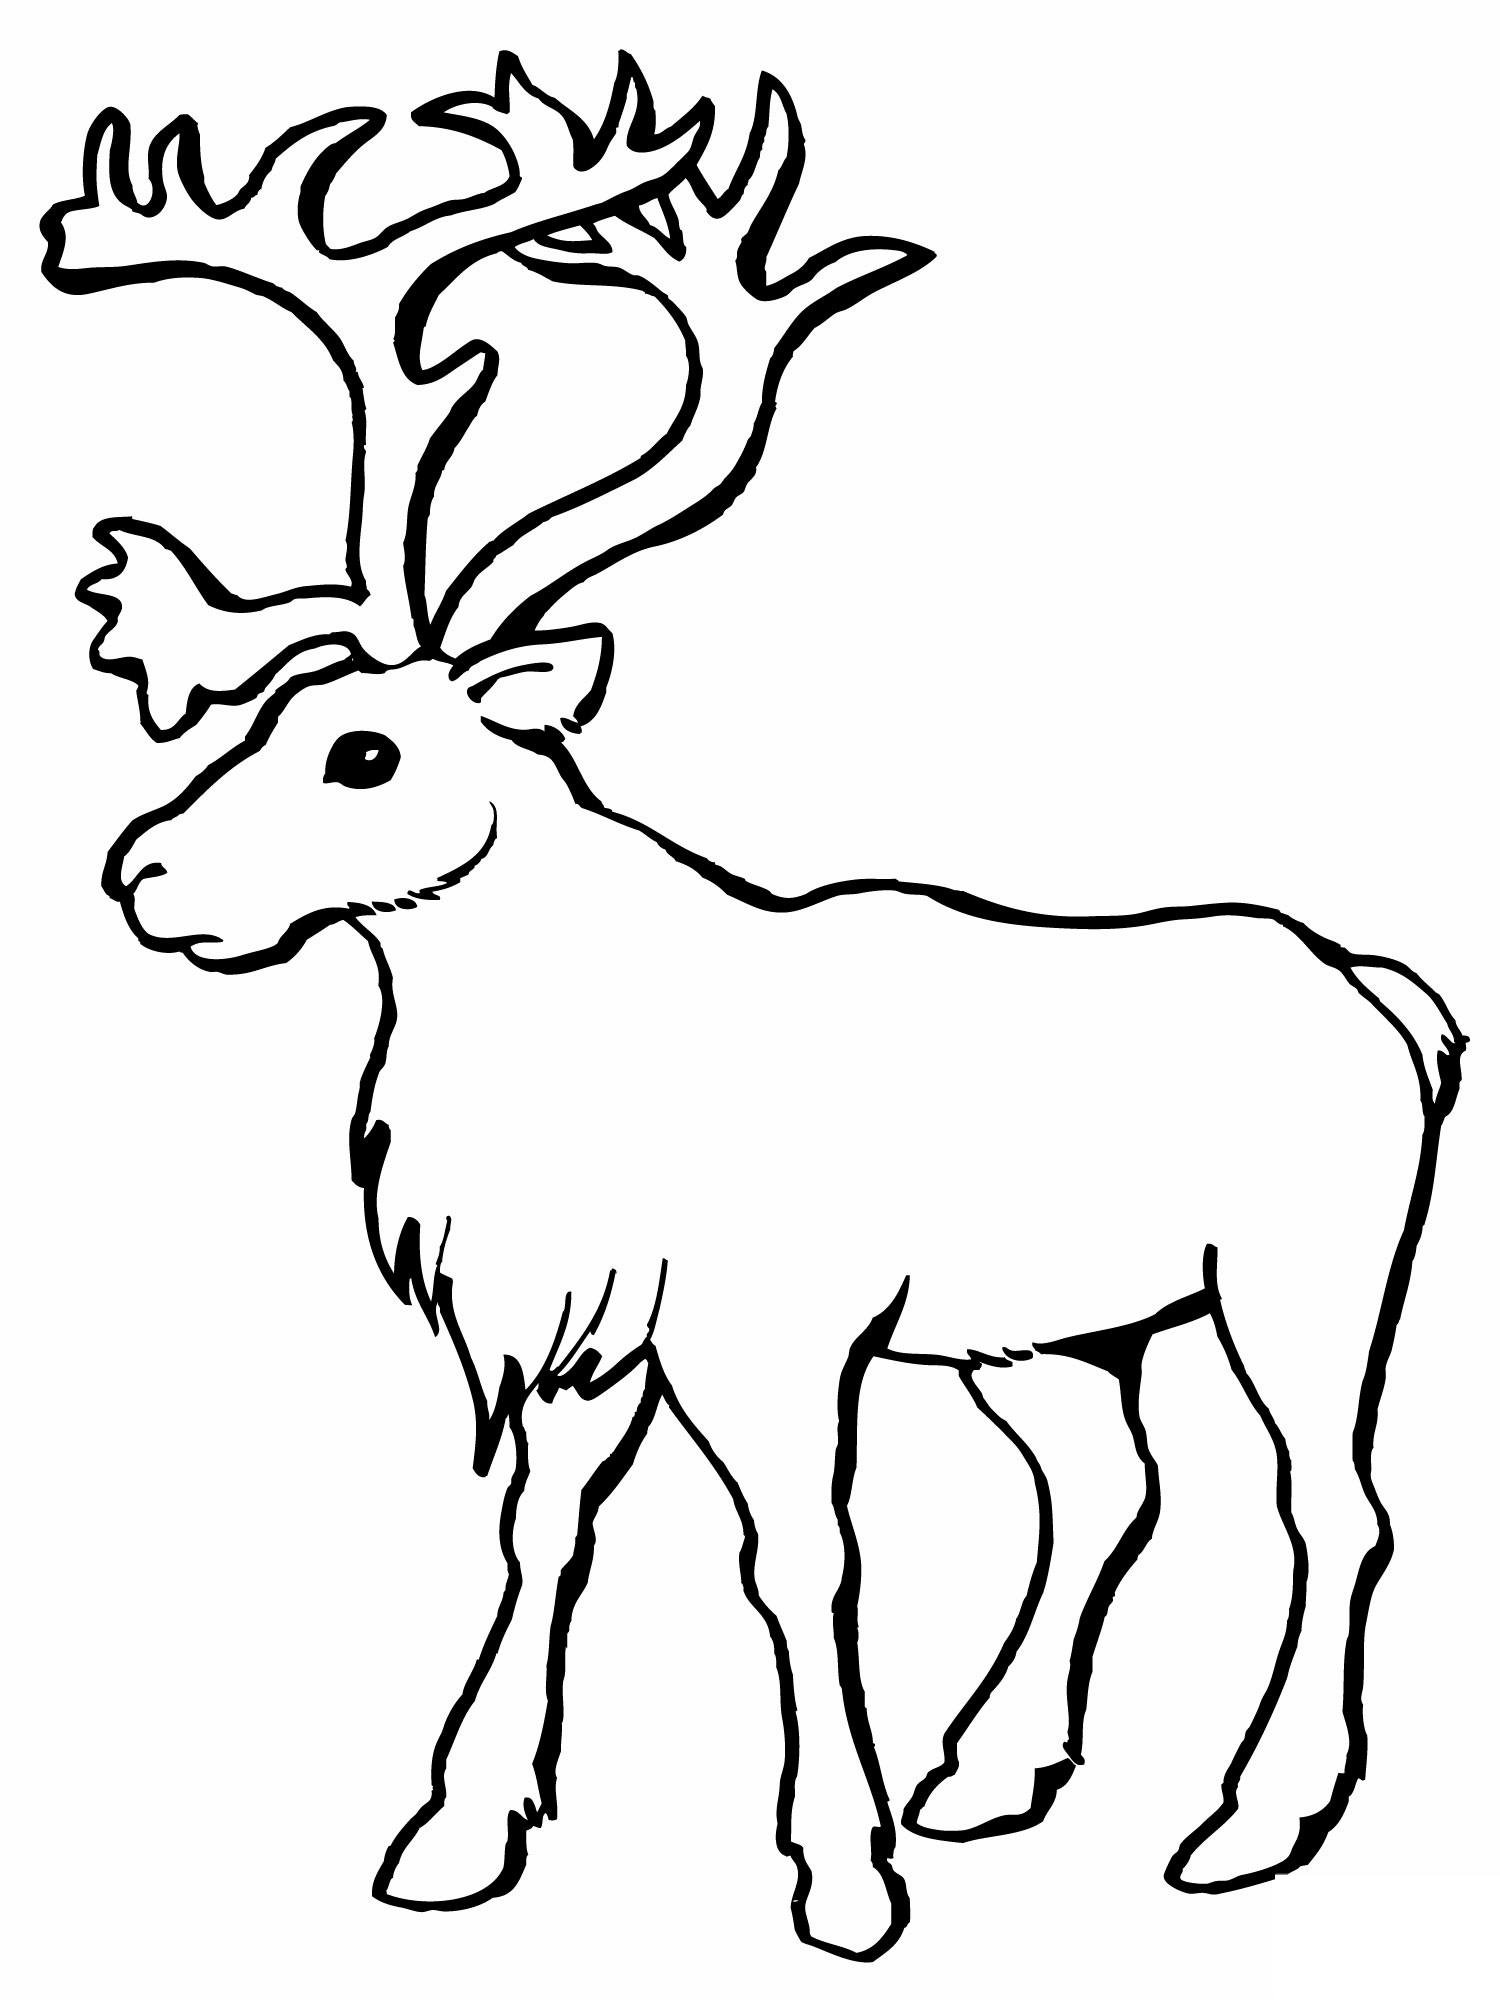 download xmas santa reindeer coloring pages or print xmas santa